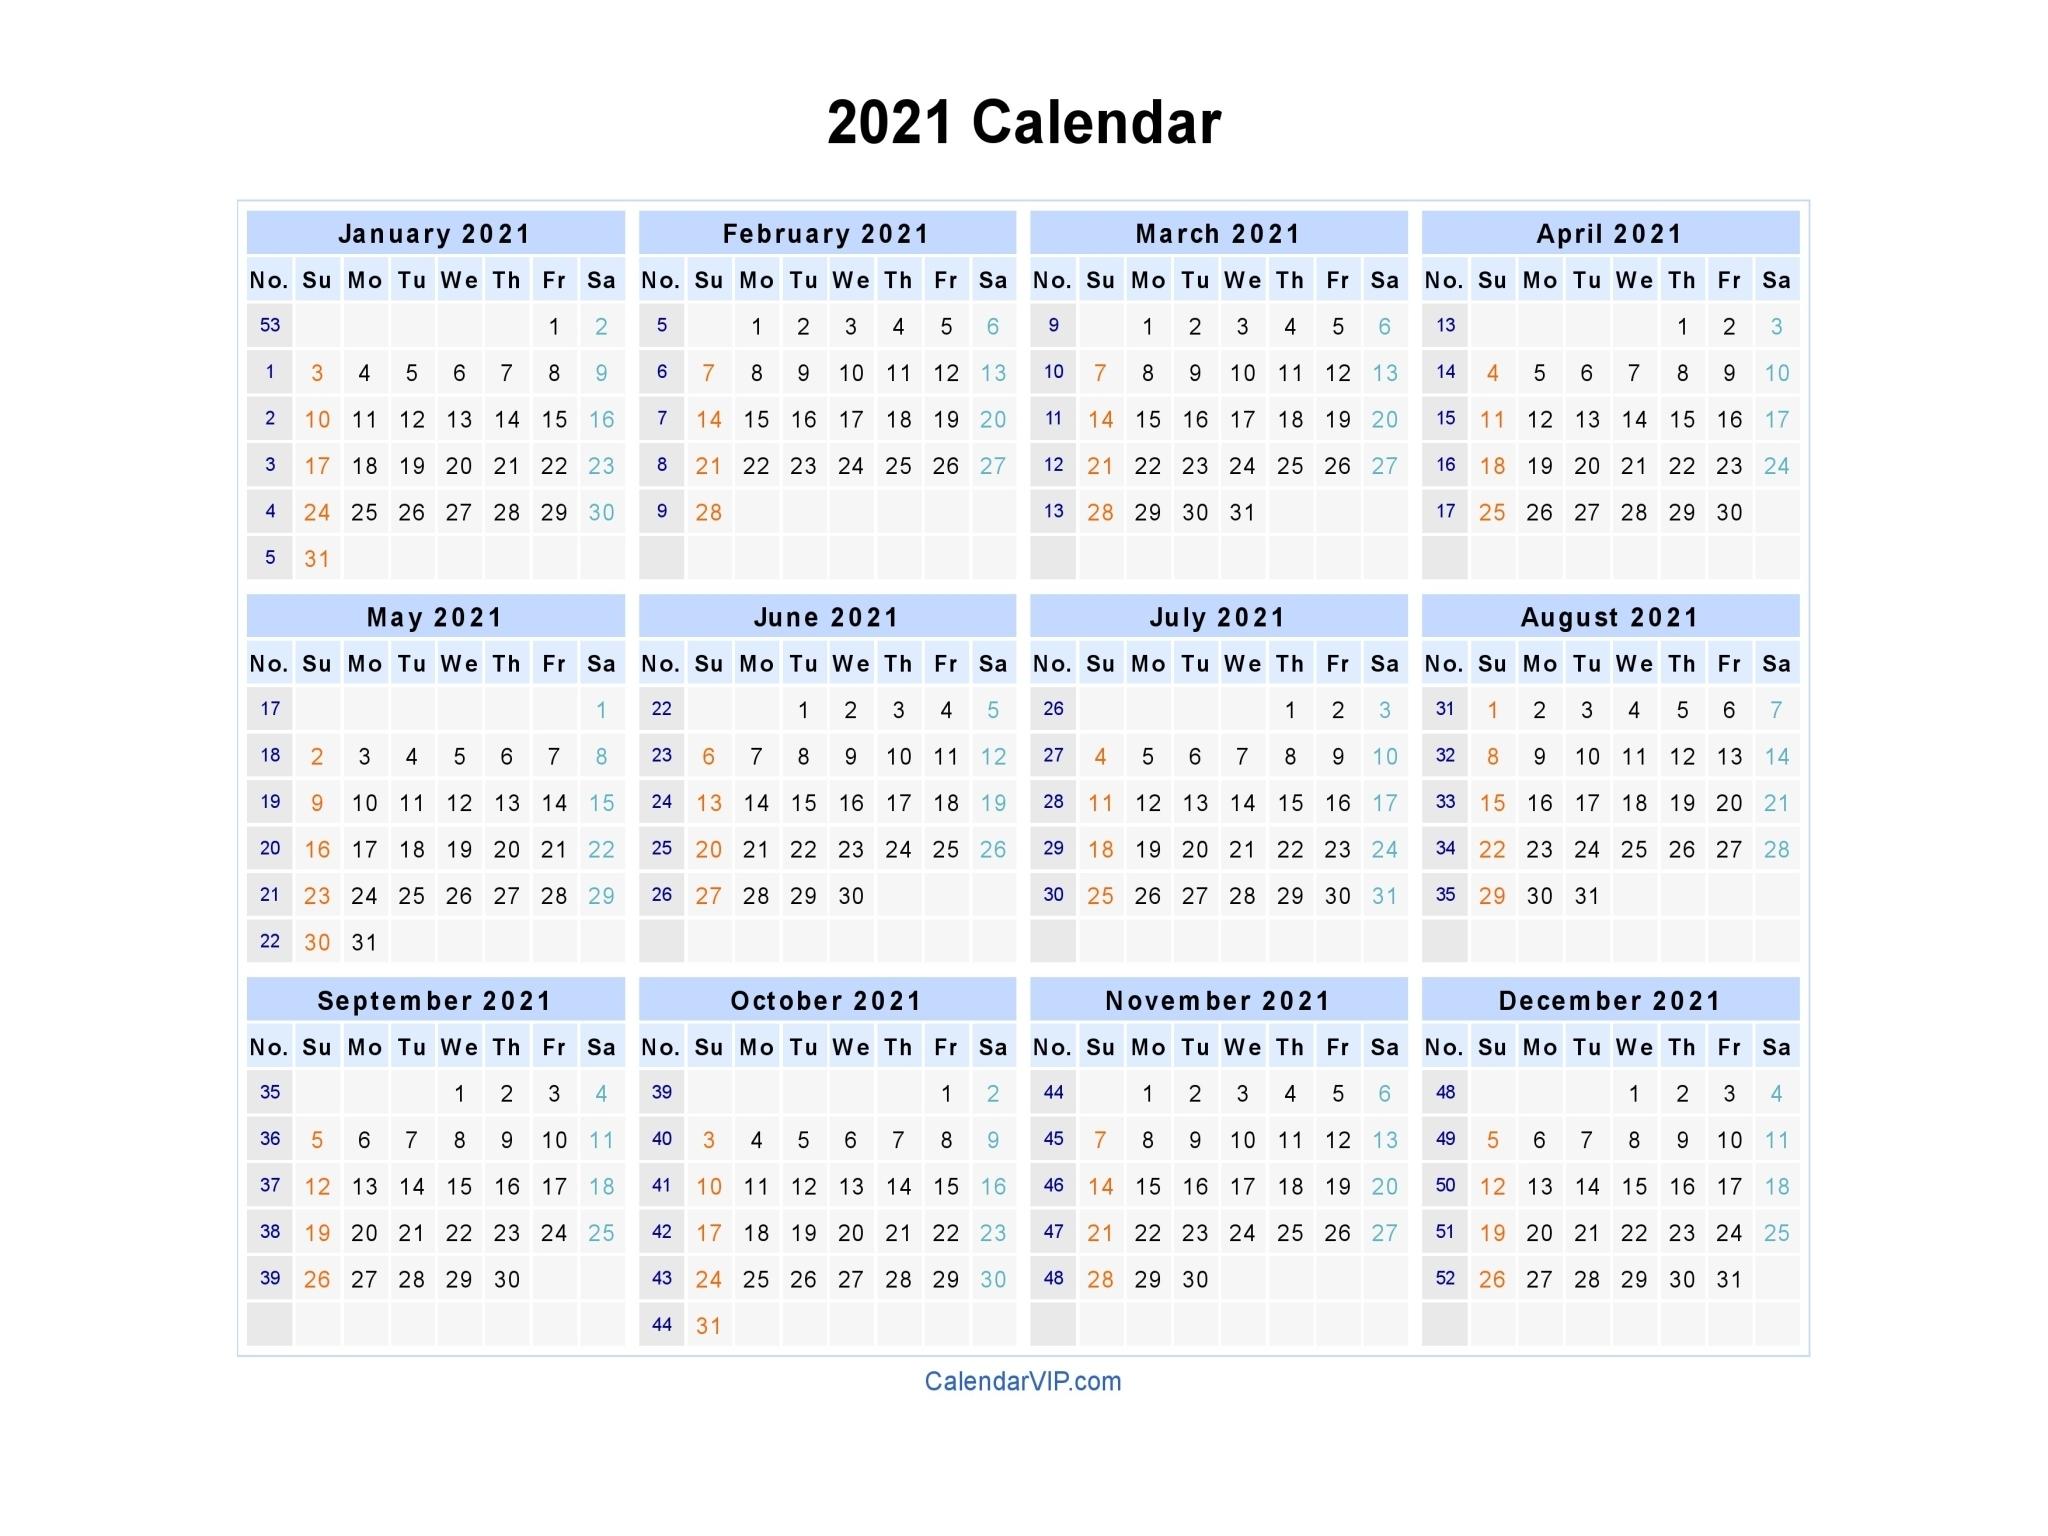 2021 Landscape Calendar   Avnitasoni in 2022 Federal Calendar Opm